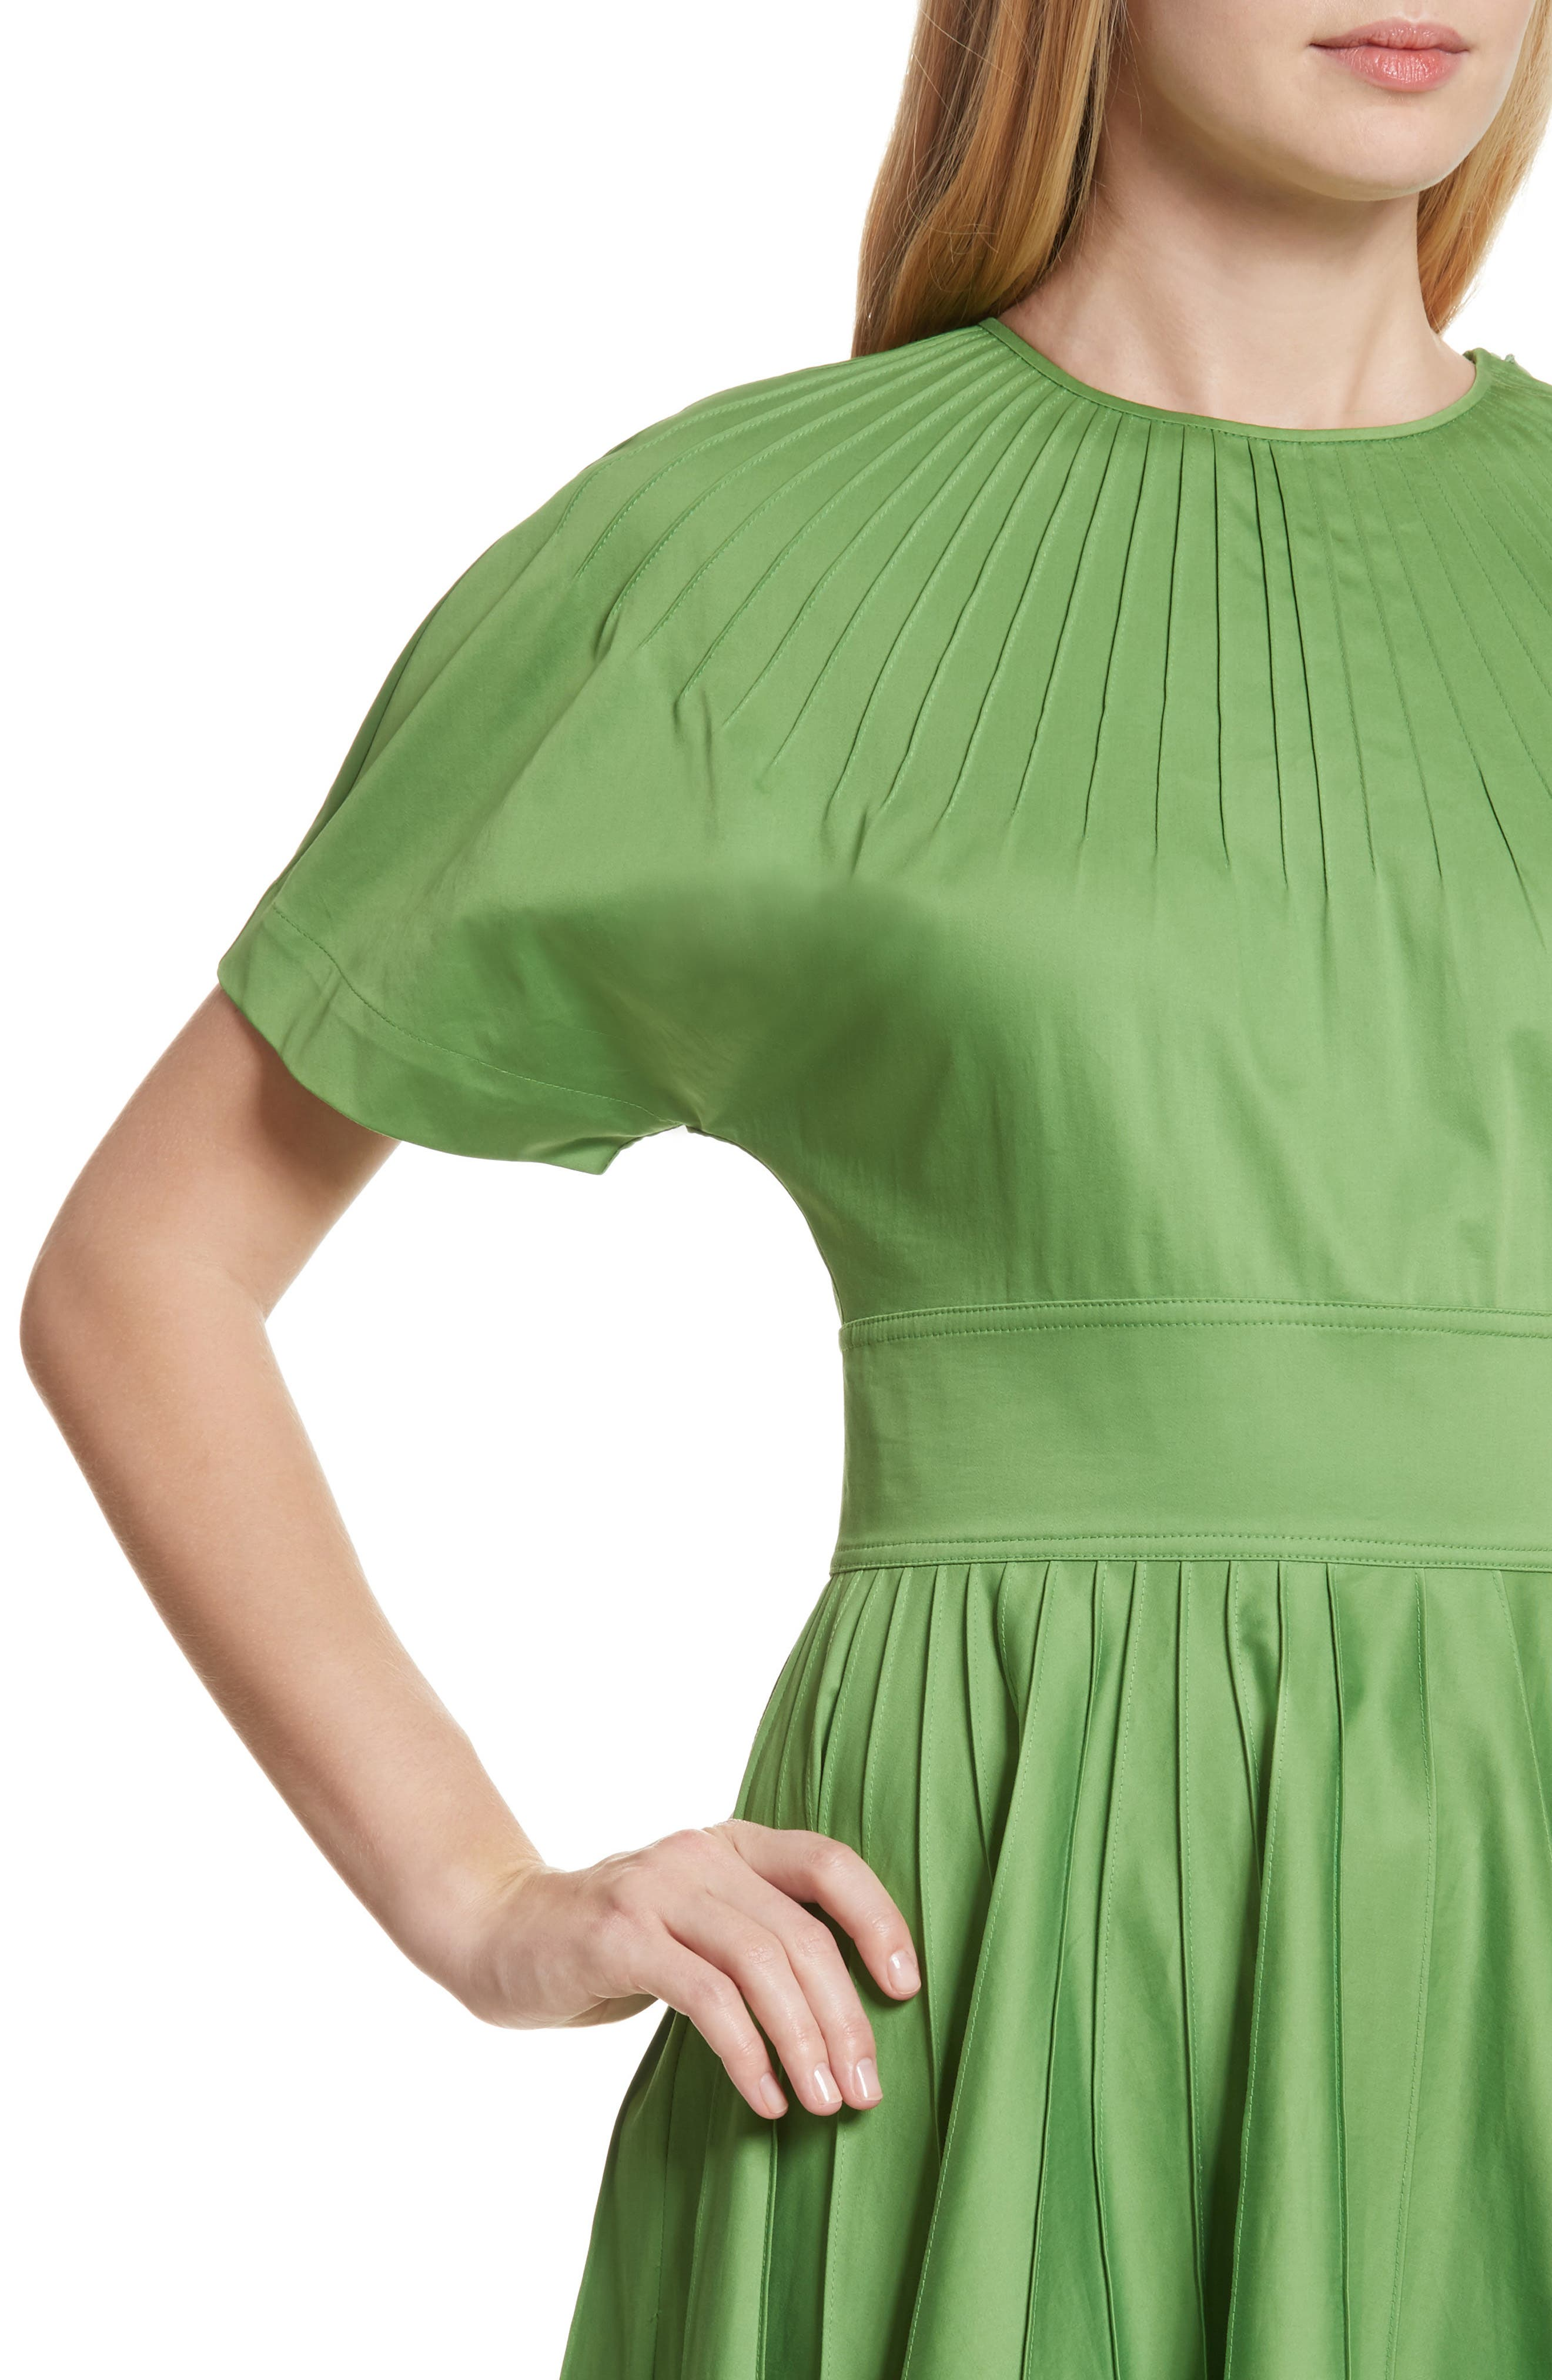 Diane von Furstenberg Pintuck Dress,                             Alternate thumbnail 4, color,                             315